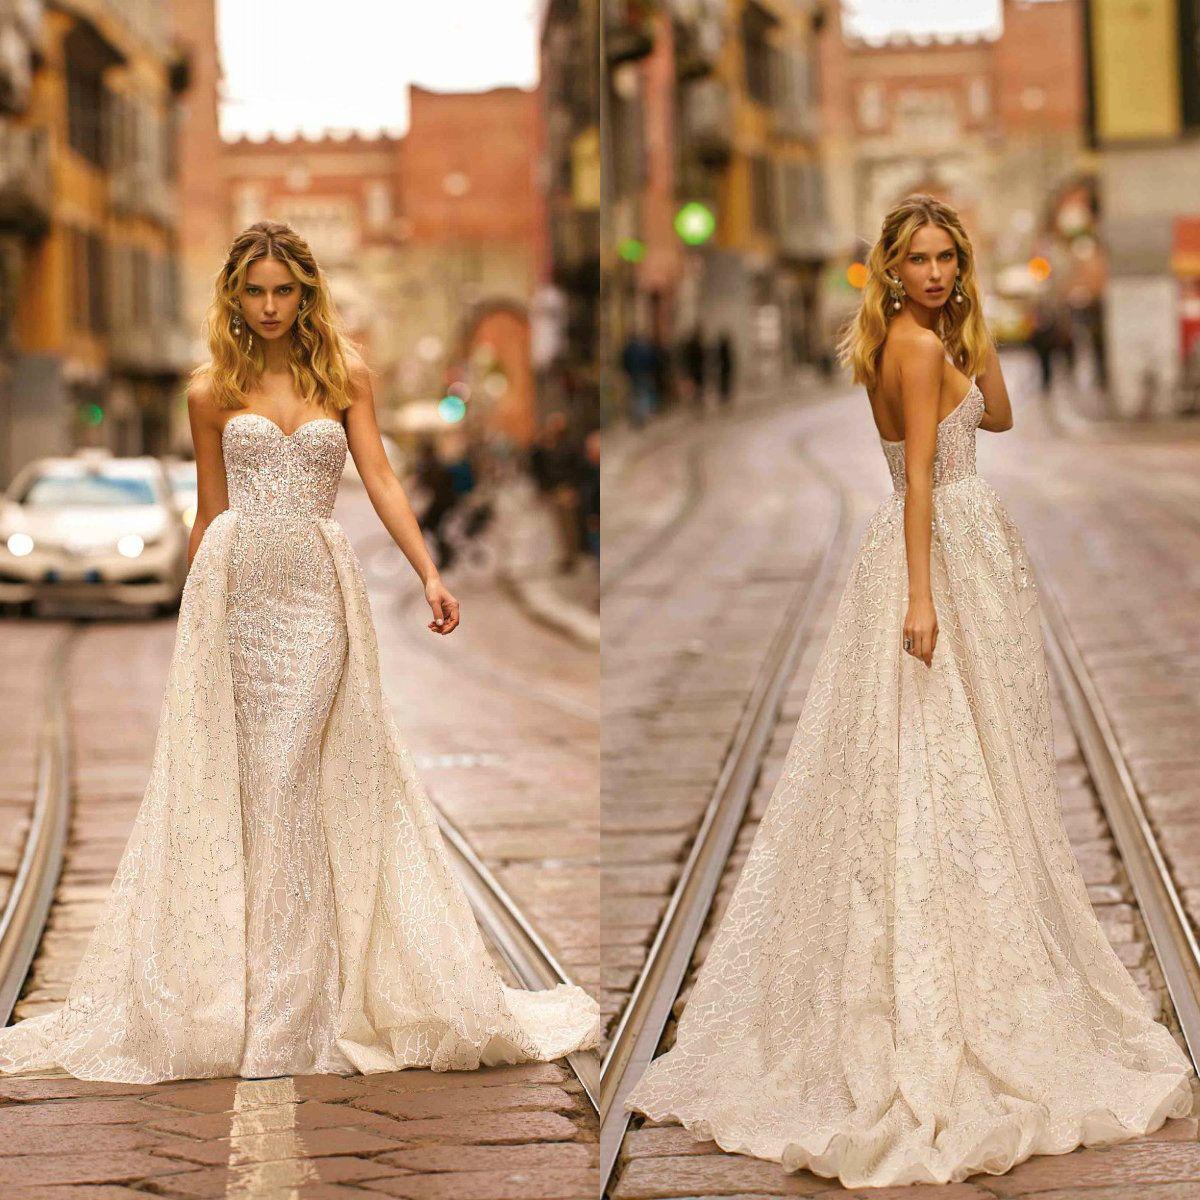 2020 Berta Mermaid Wedding Dresses With Detachable Train Sweetheart Sweep Train Lace Beaded Wedding Dress Custom Made Long Robe De Mariee